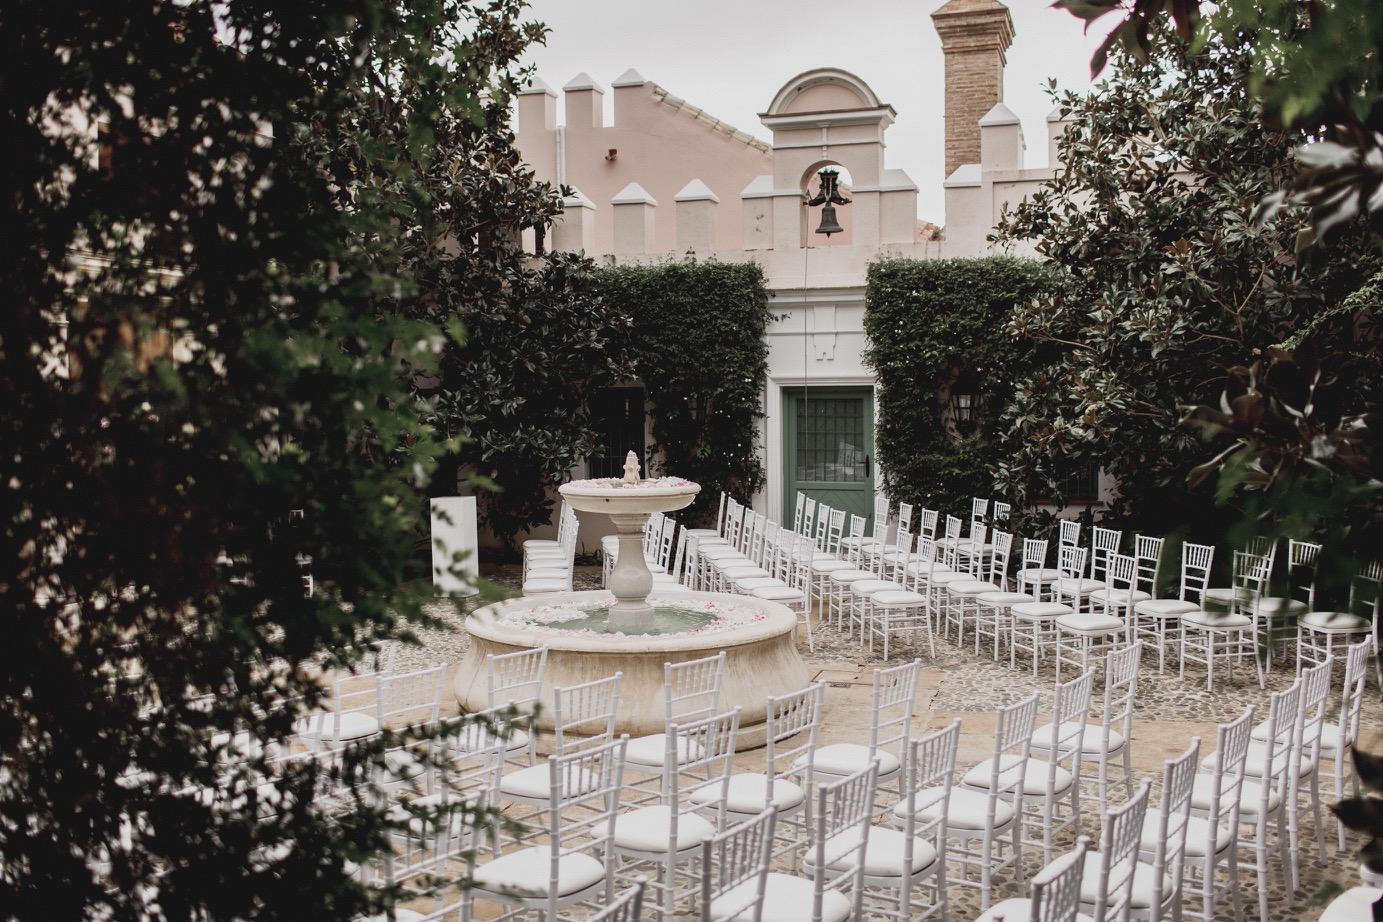 Si-Quiero-Wedding-Planner-By-Sira-Antequera-Bodas-Málaga-Marbella-Miami- Patricia-Juanlu-10